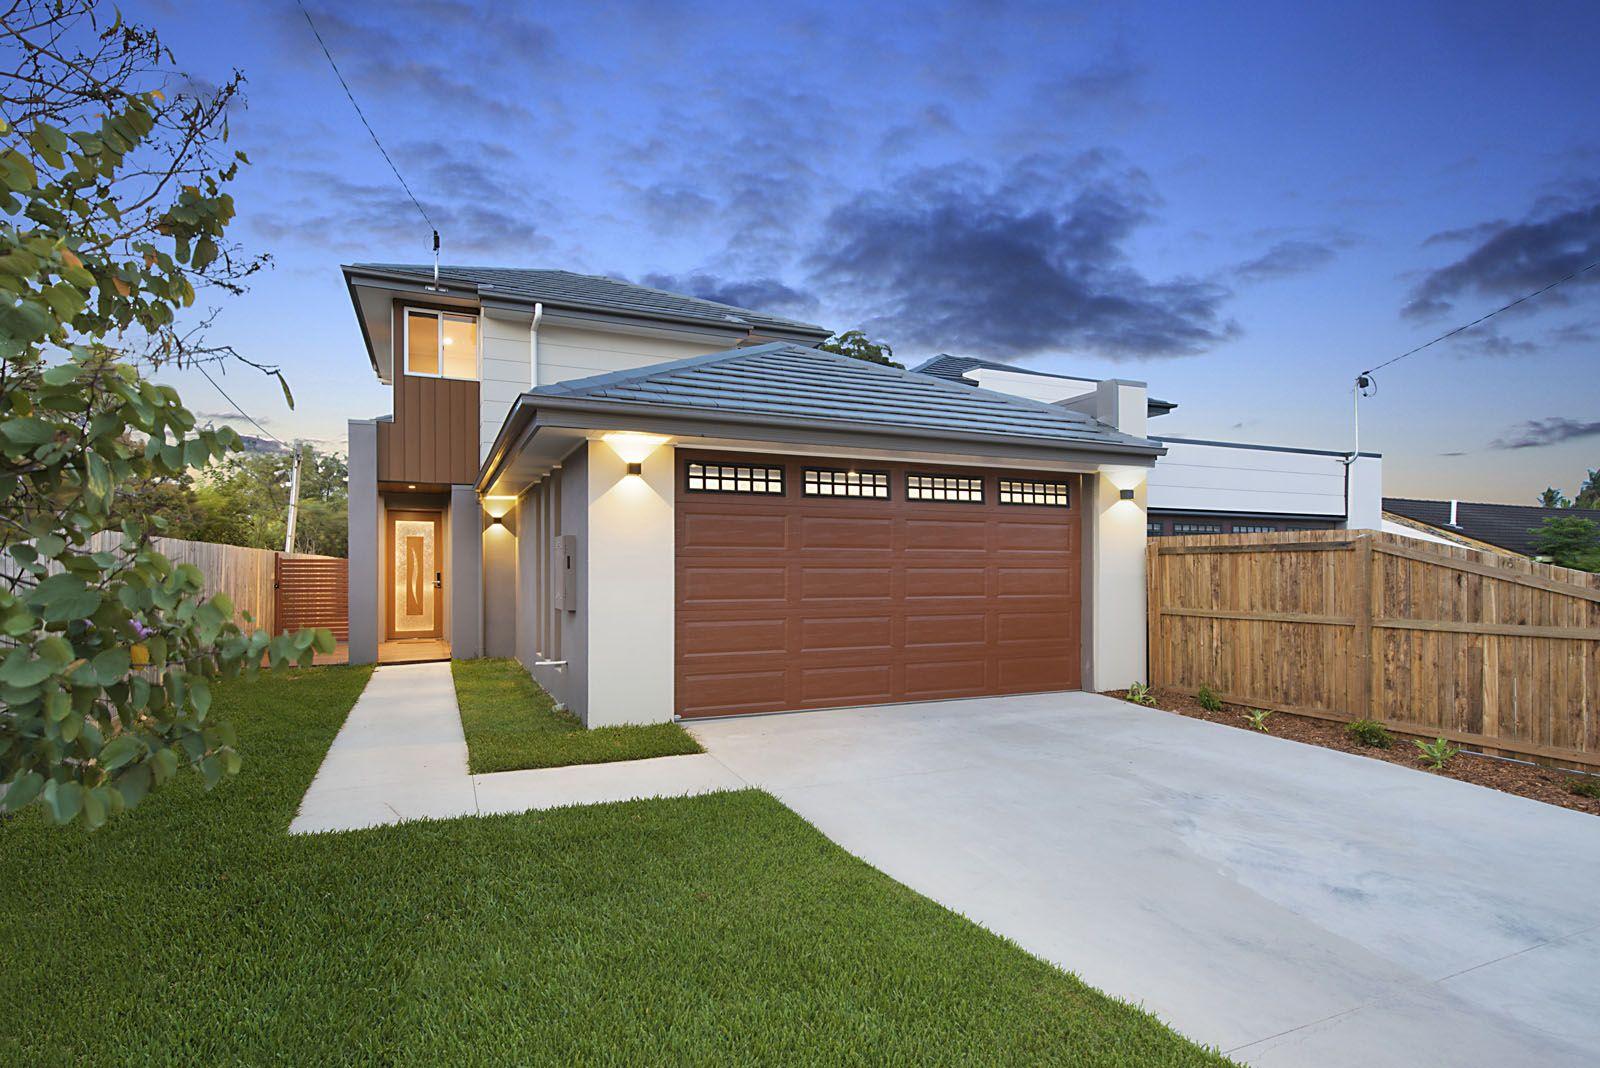 177 Lister St, Sunnybank QLD 4109, Image 0